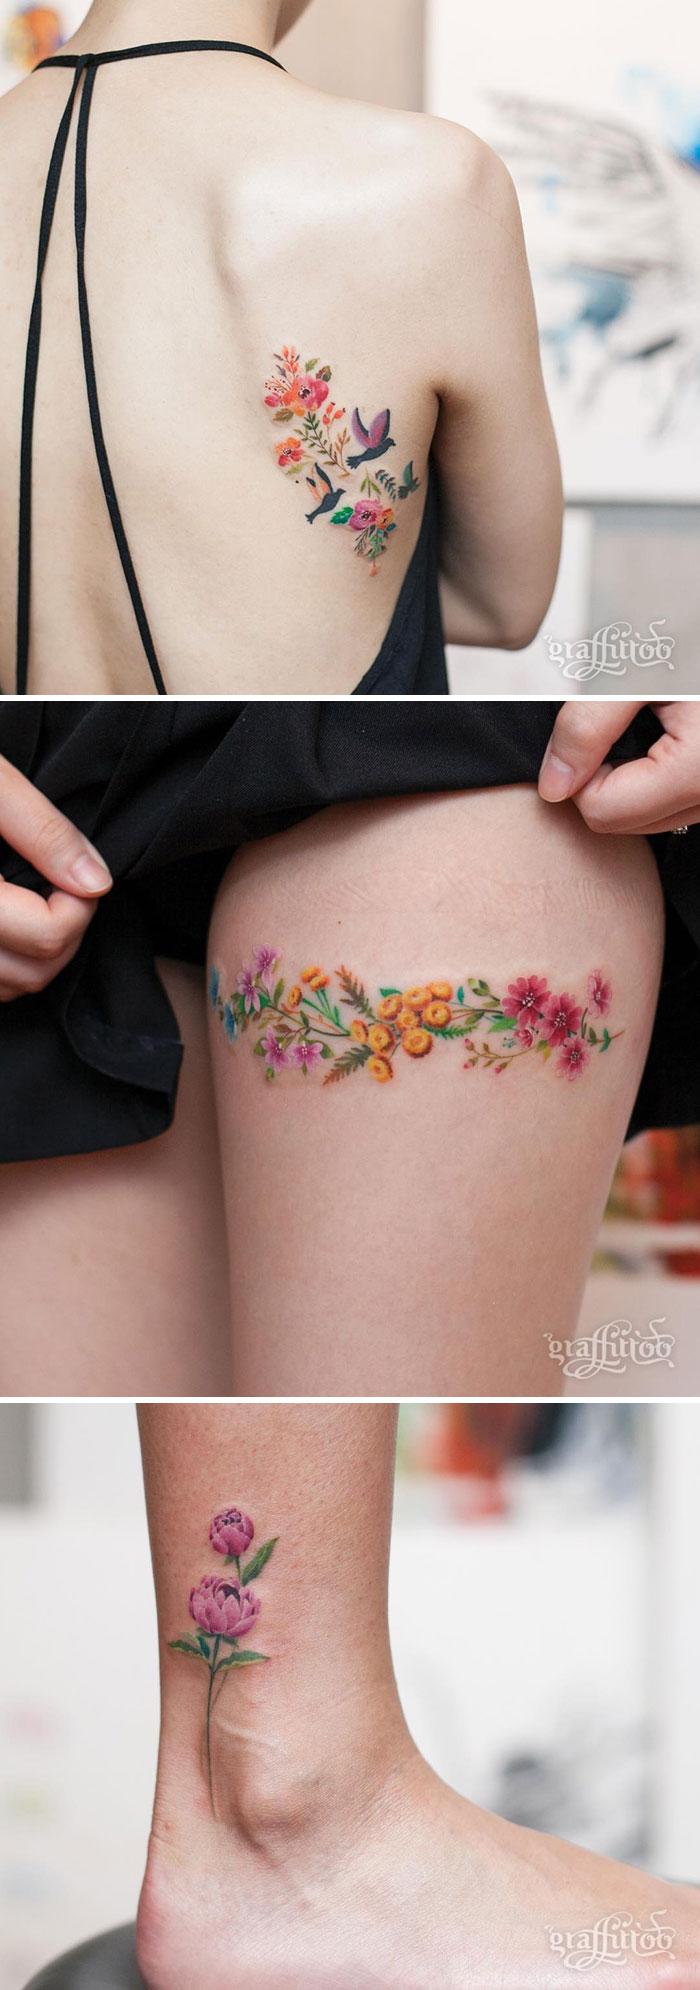 tatuagens-florais (5)